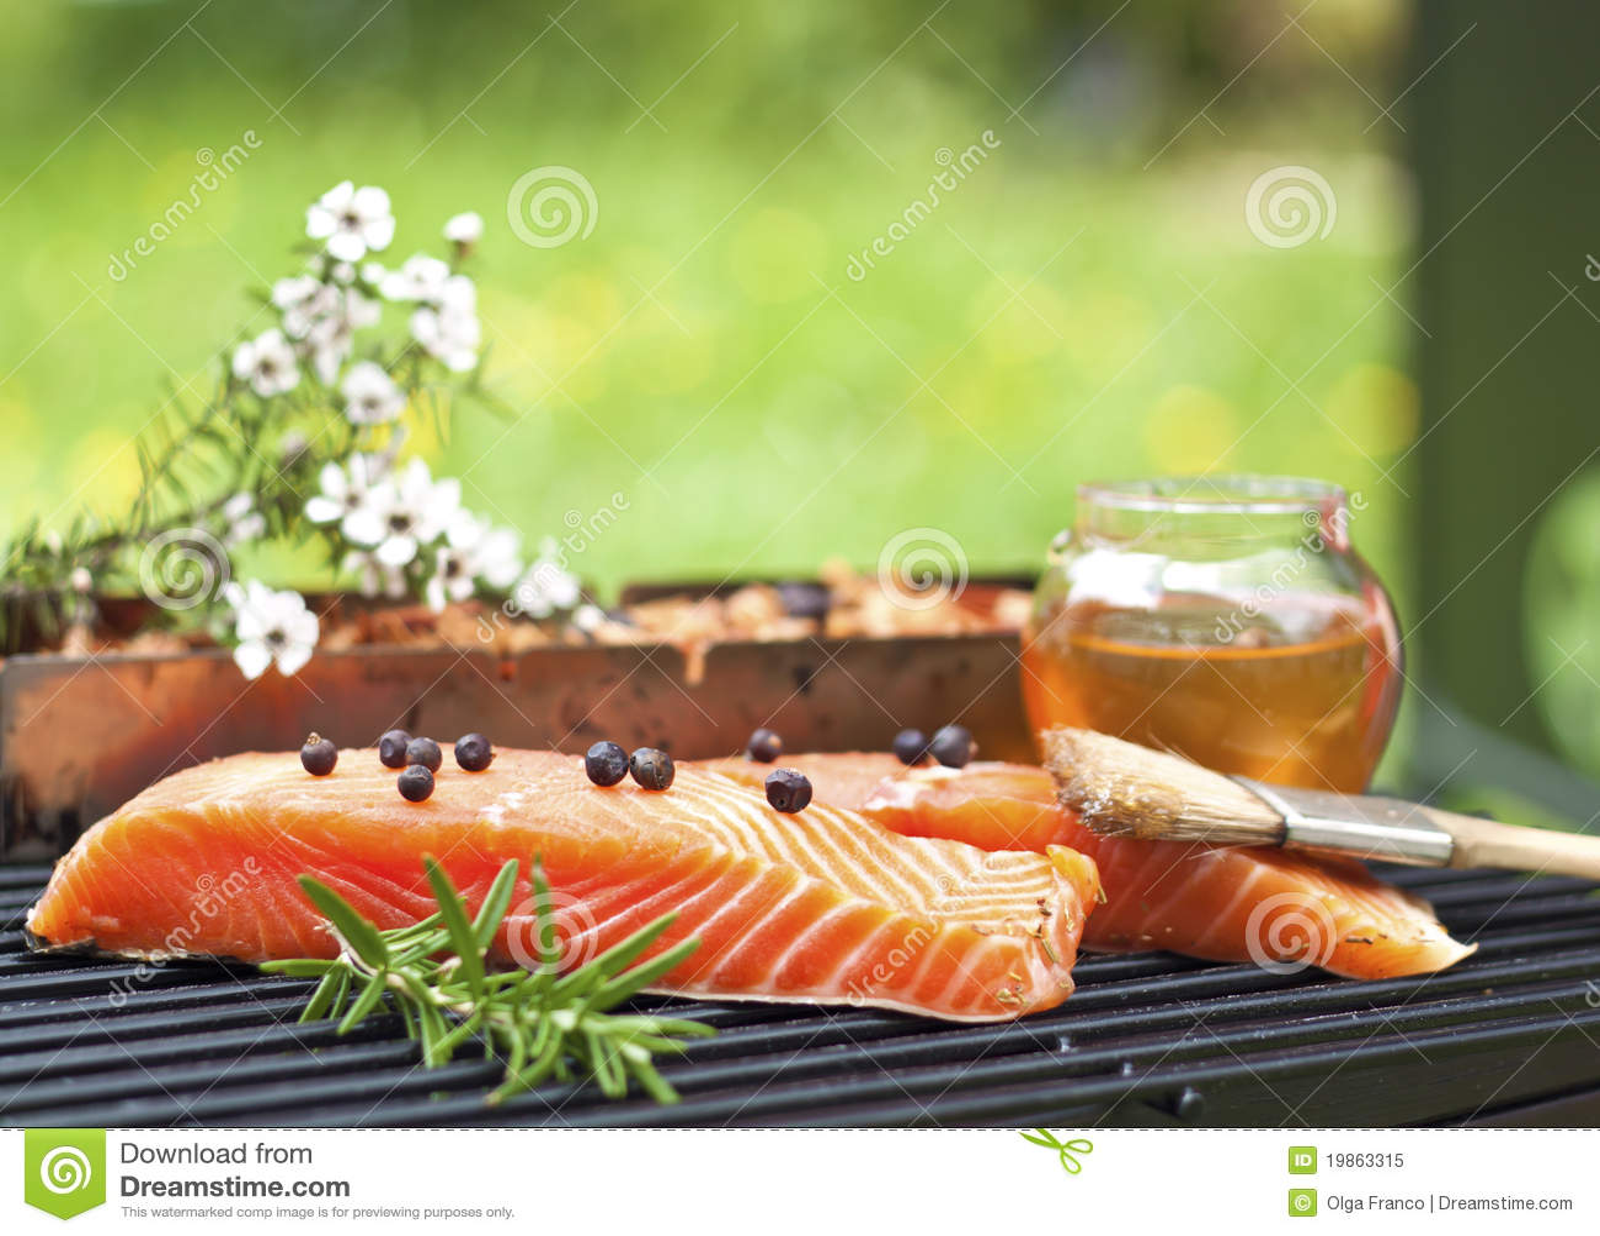 Manuka and honey smoked salmon